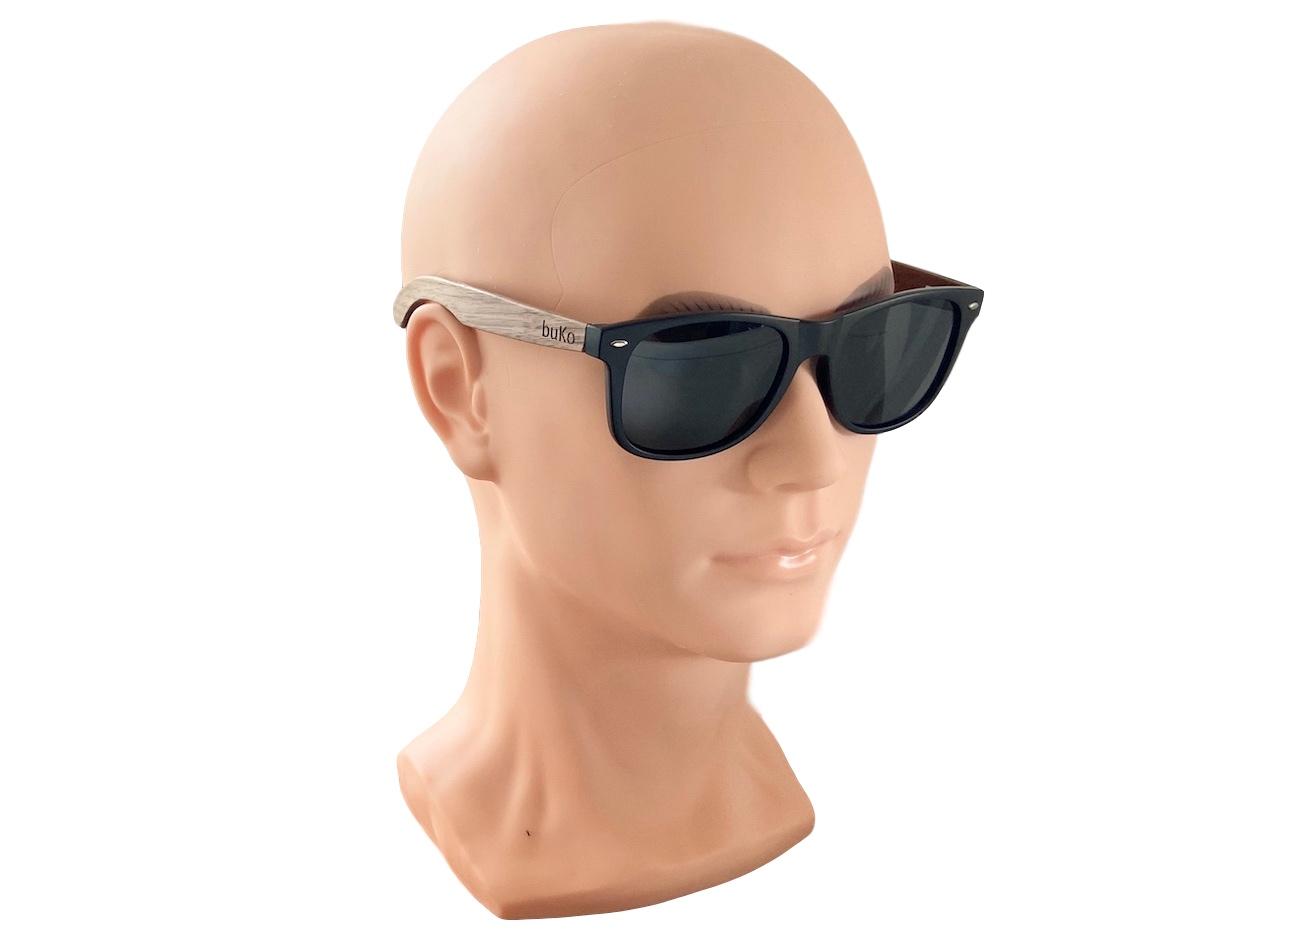 Runaway wooden sunglasses on male model